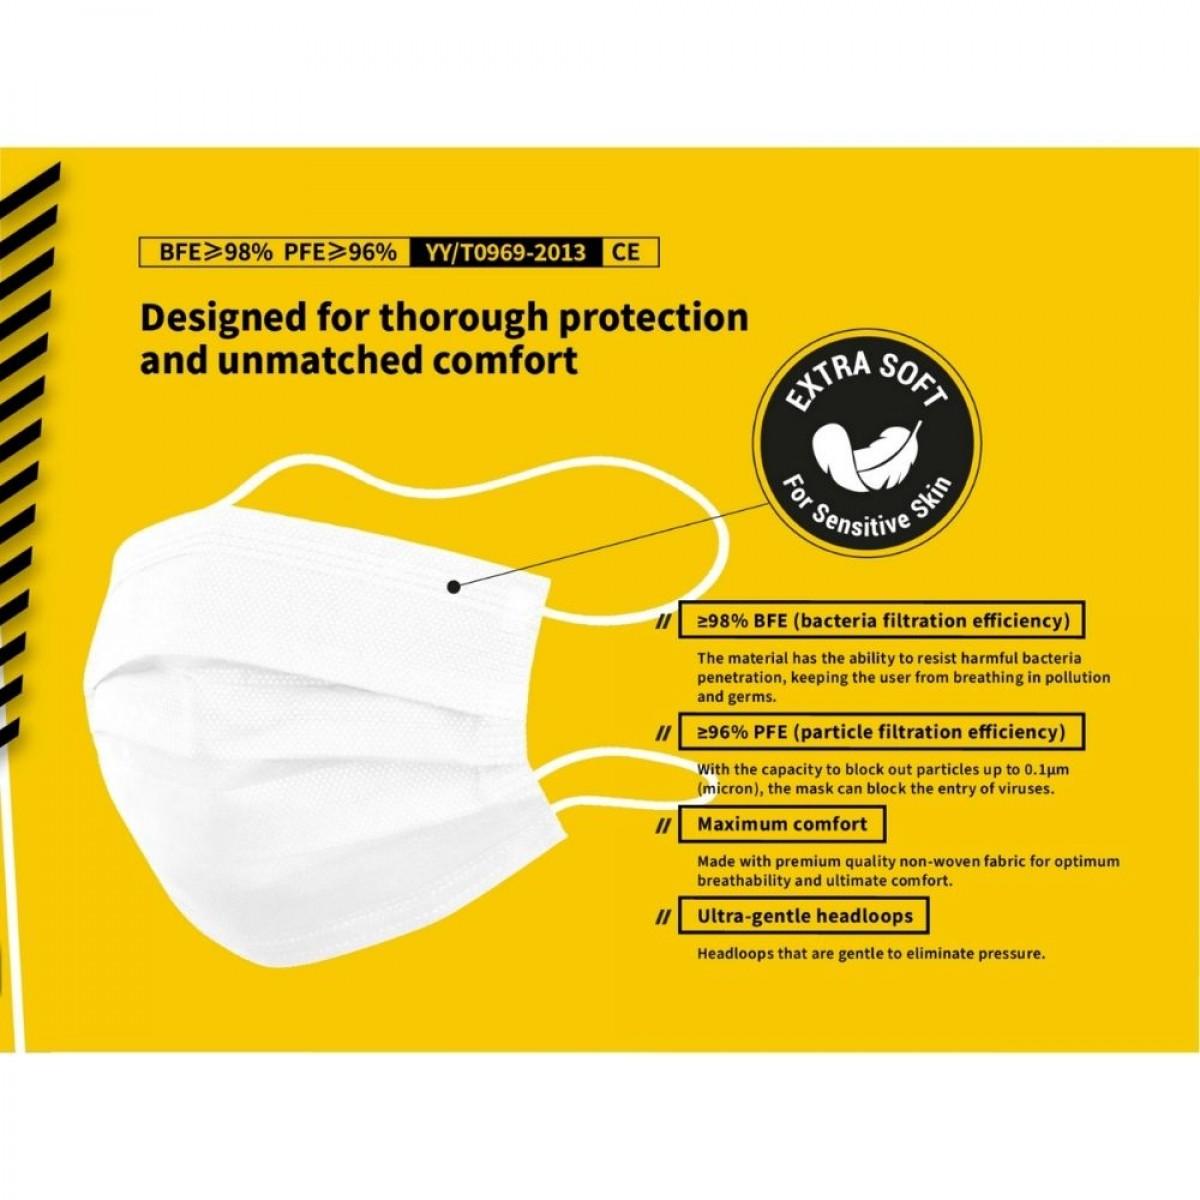 Neutrovis Hijab Premium Medical Face Mask for Sensitive Skin (Extra Soft) 50pcs